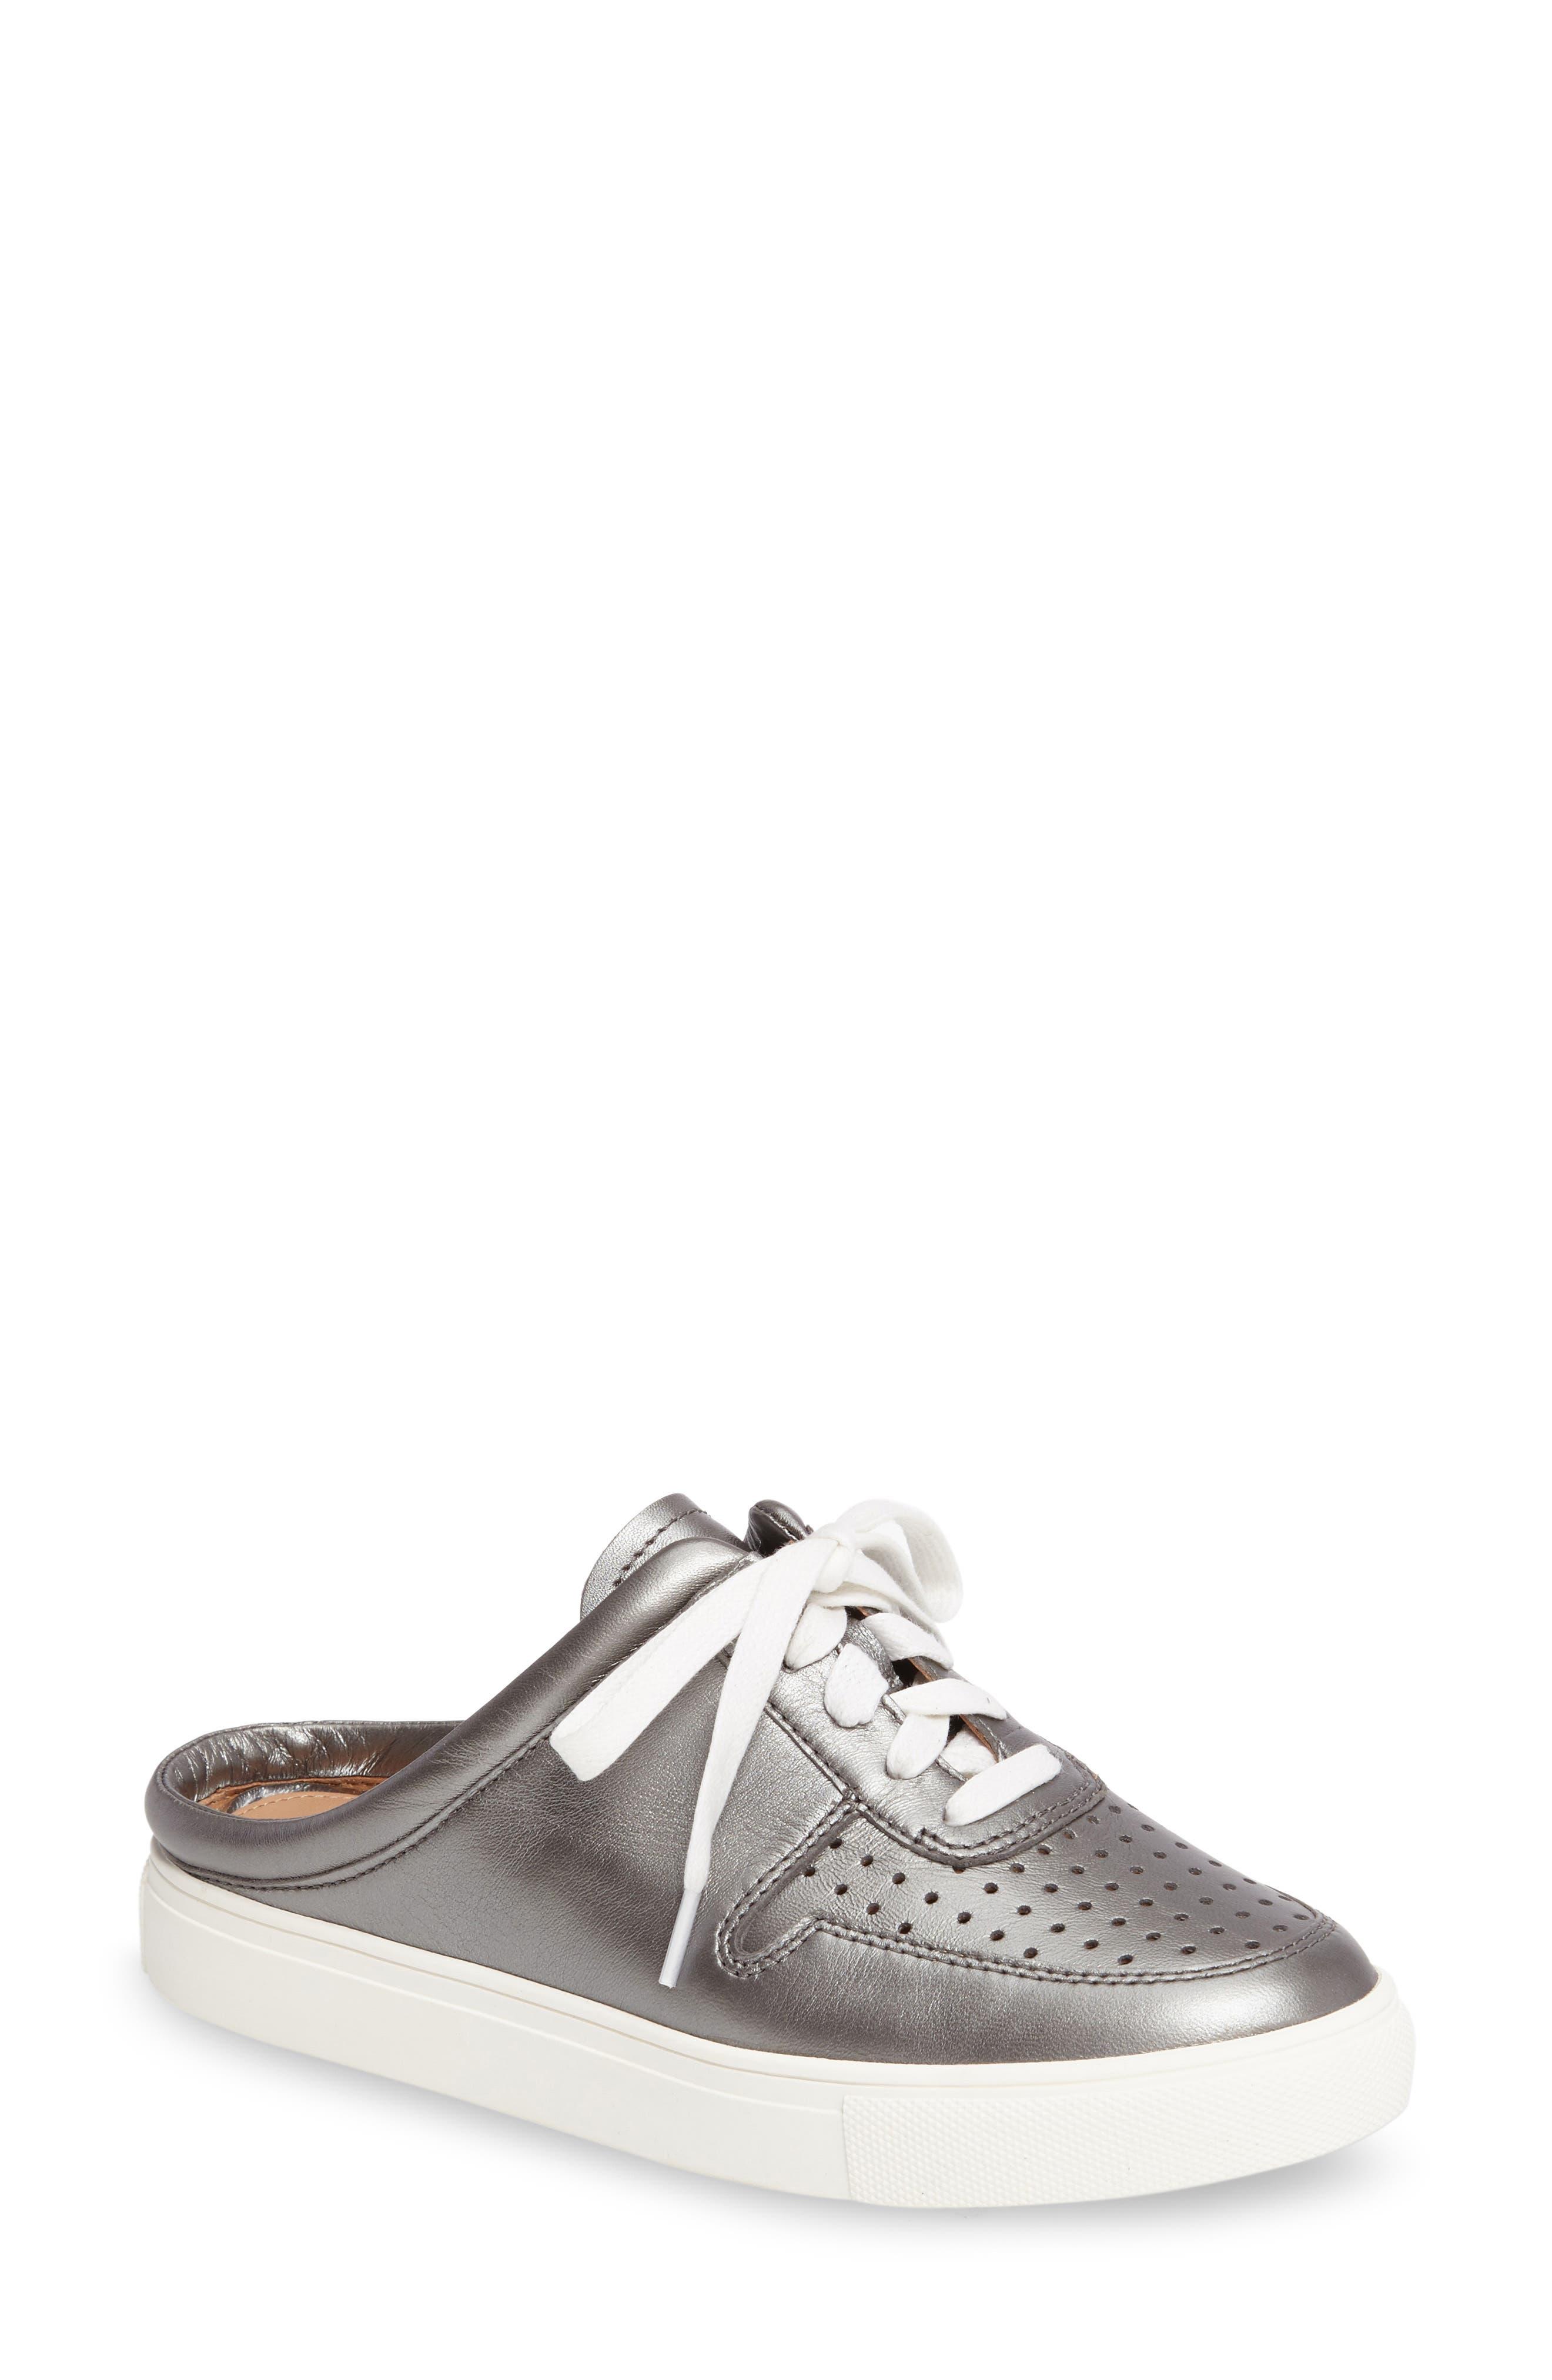 Kacy Perforated Slide Sneaker,                             Main thumbnail 1, color,                             040